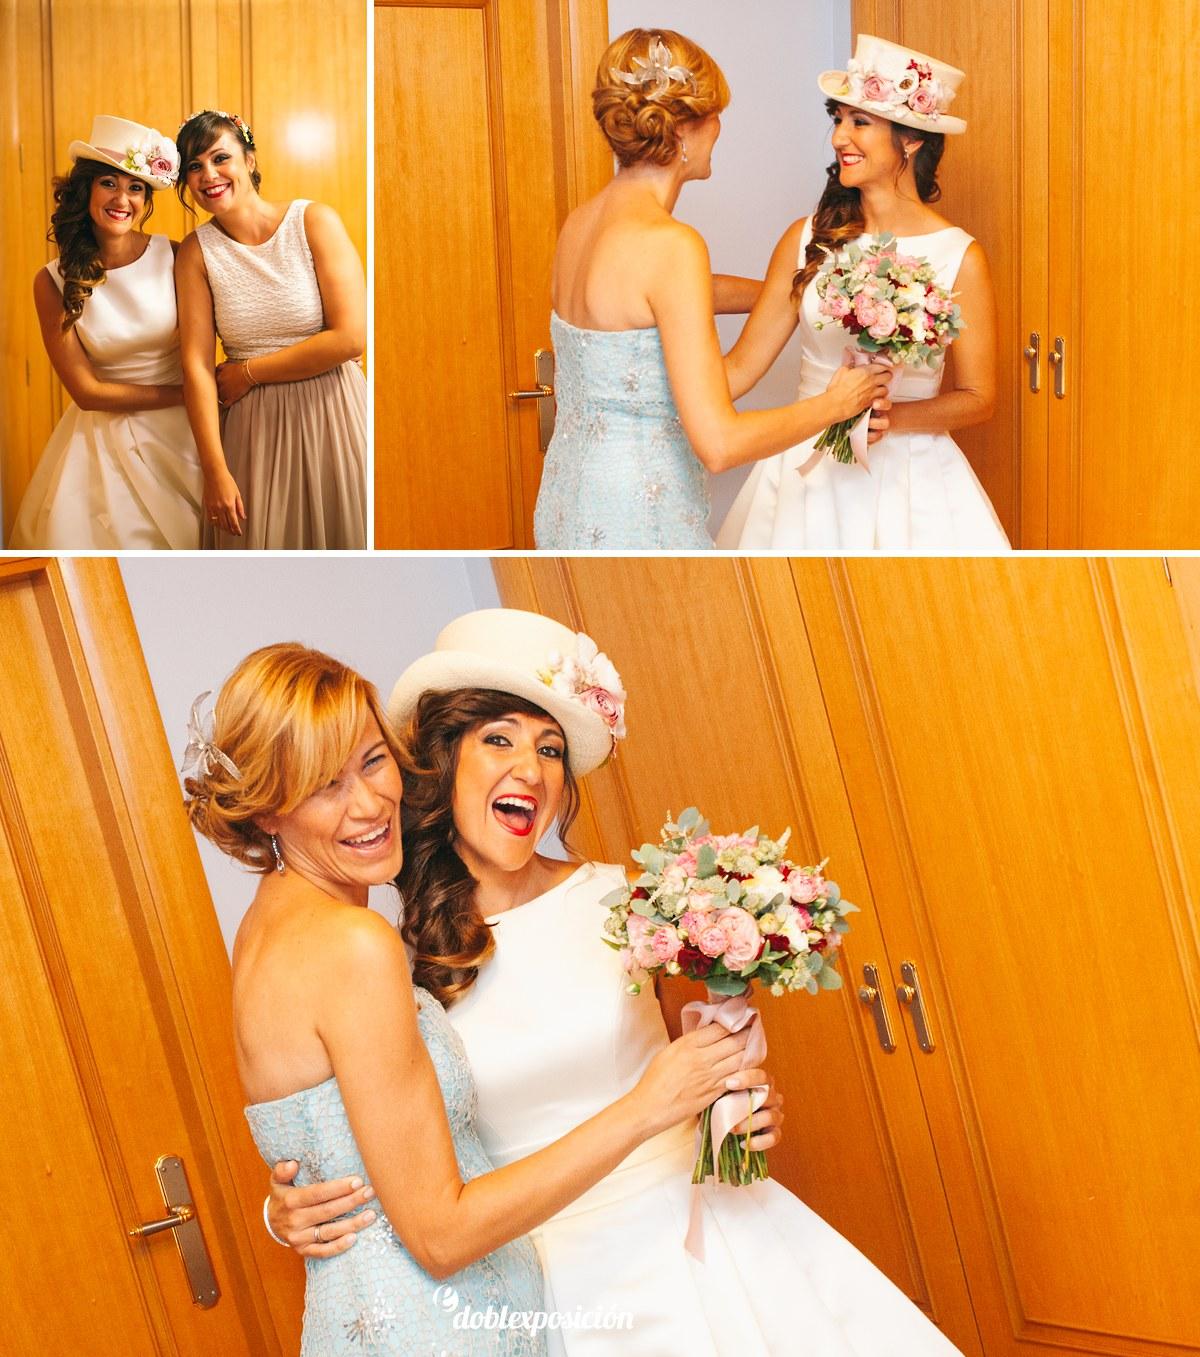 fotografos-boda-finca-restaurante-jardines-nou-cucuch-elche-novelda_0011